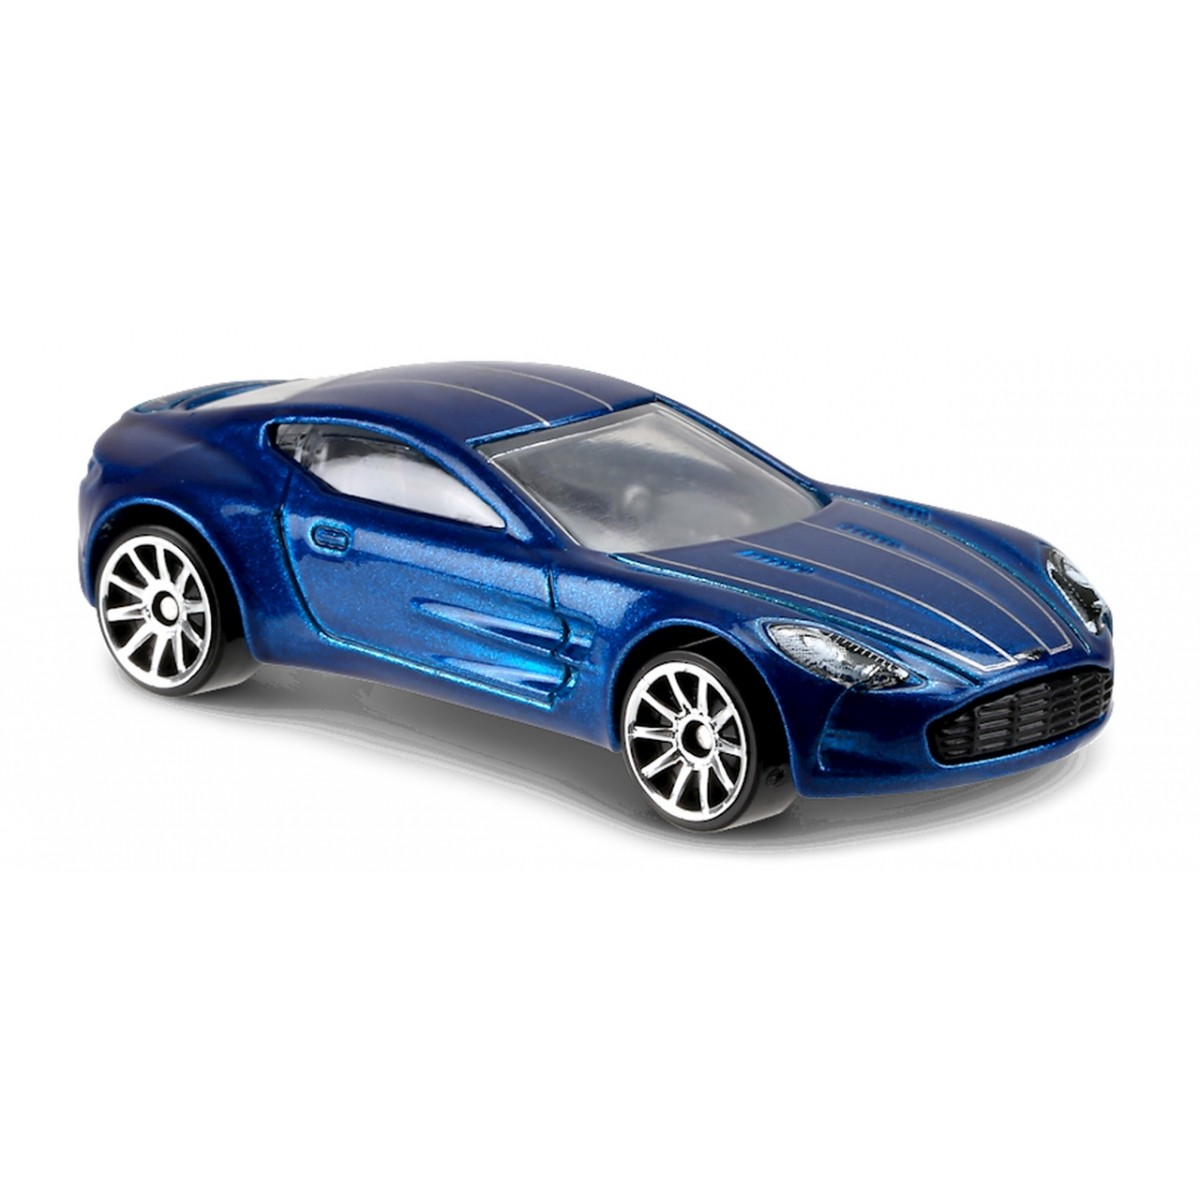 Carrinho Hot Wheels: Aston Martin One-77 Azul